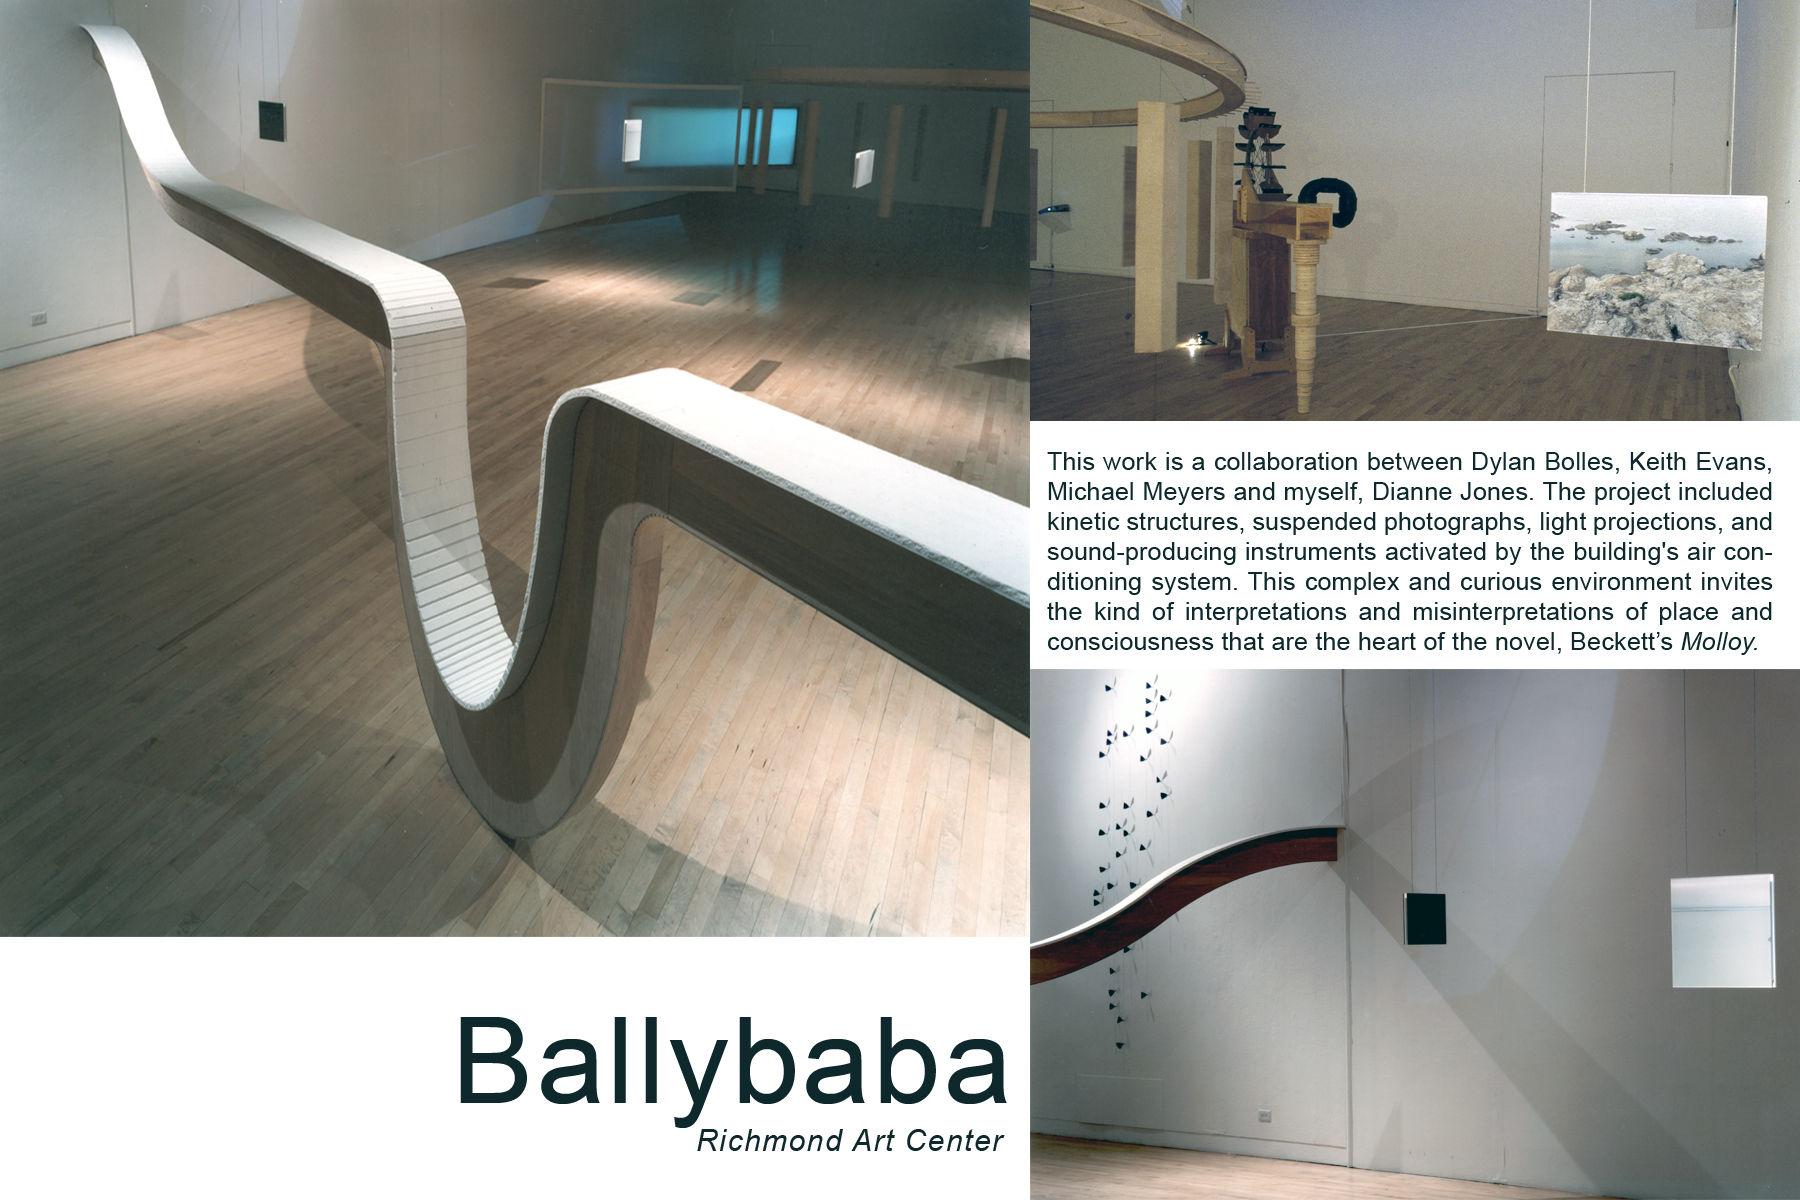 1ballybaba02.jpg